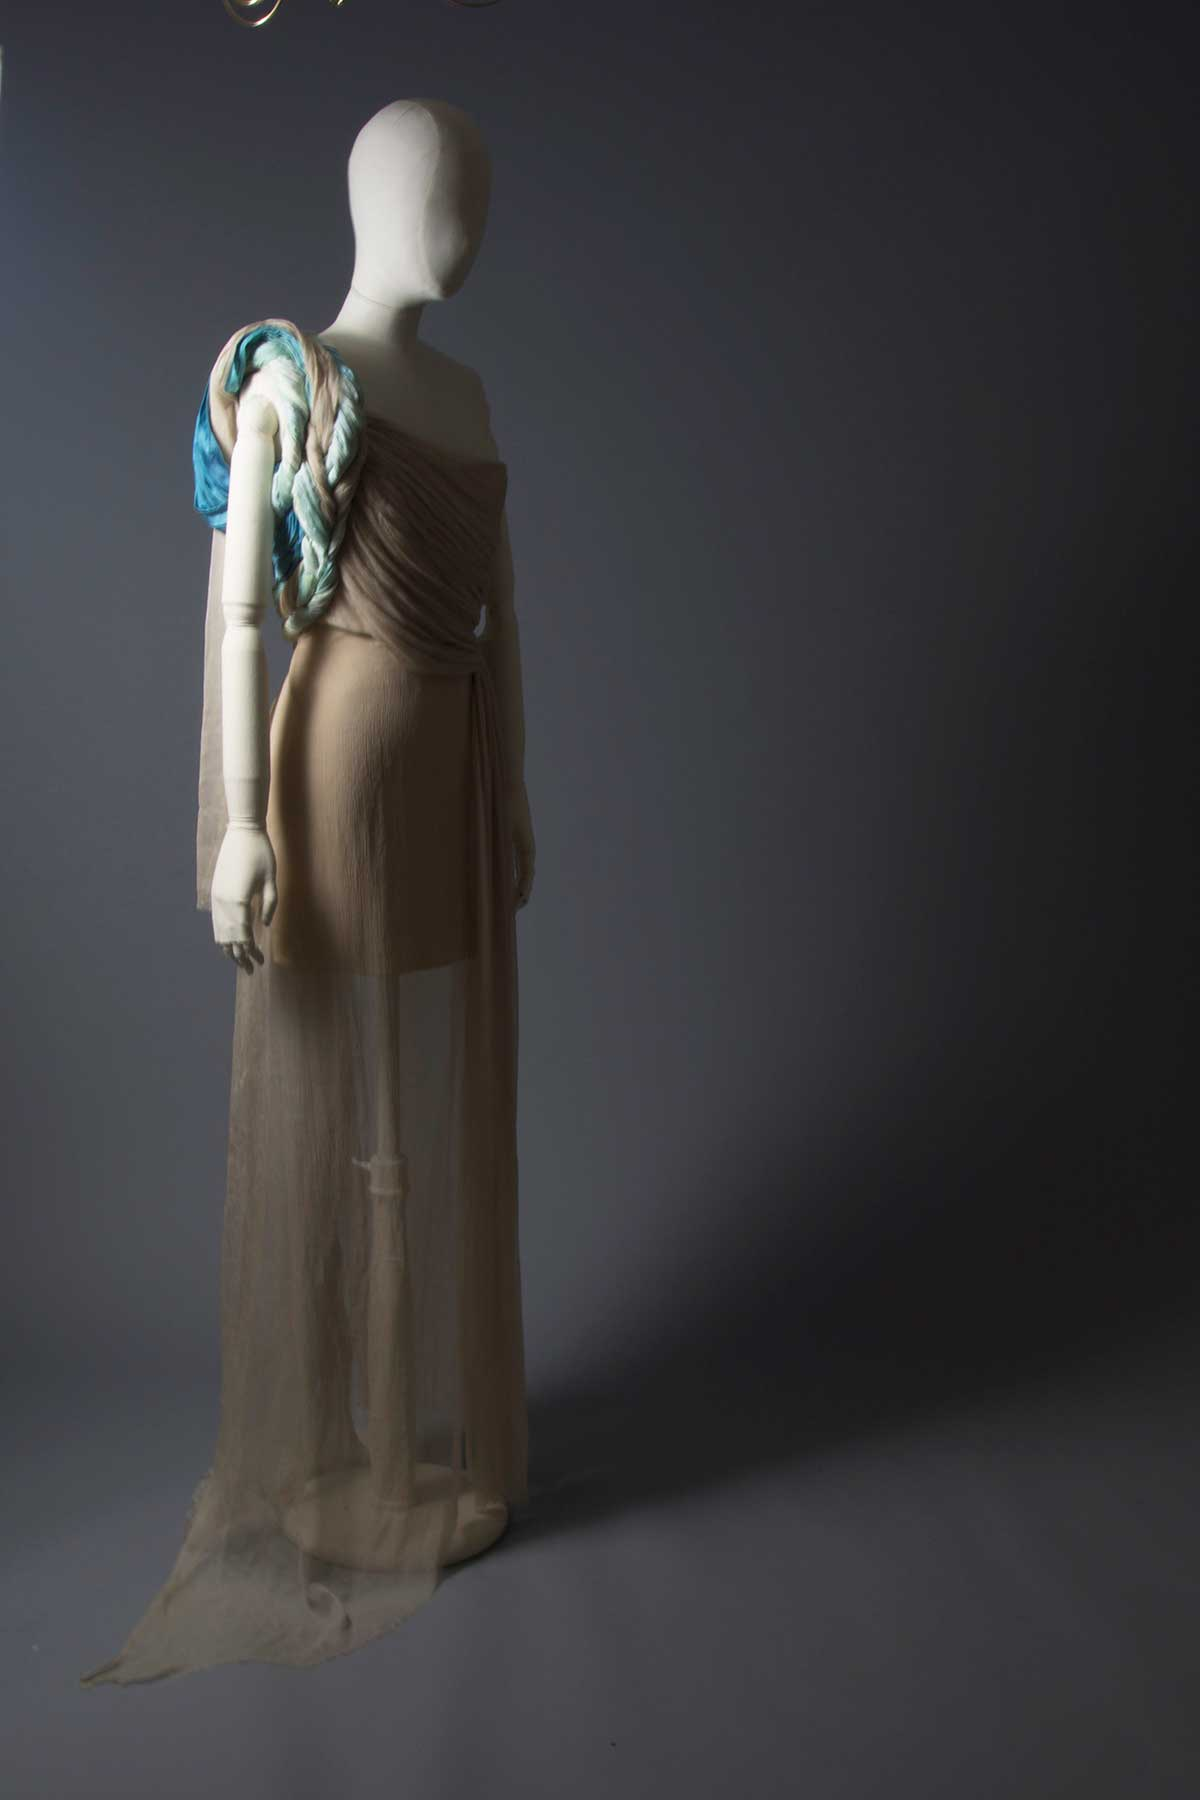 Sleeping Vegas dress, Arizona Journey